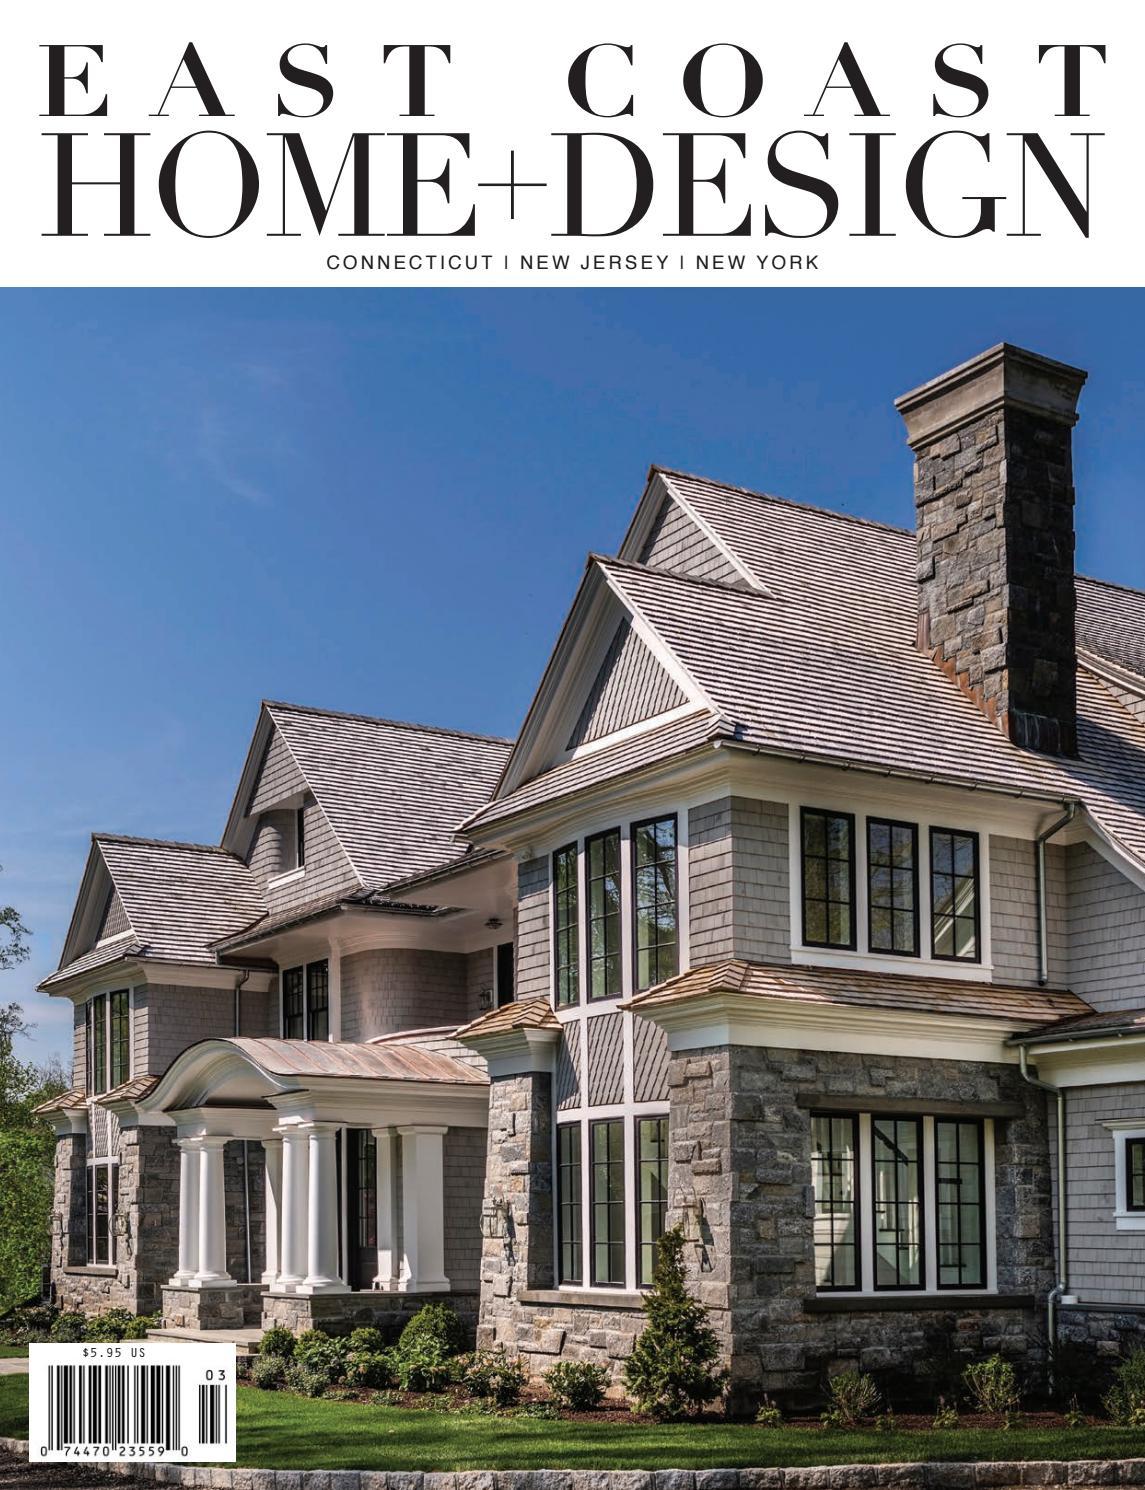 East coast home design by east coast home publishing issuu